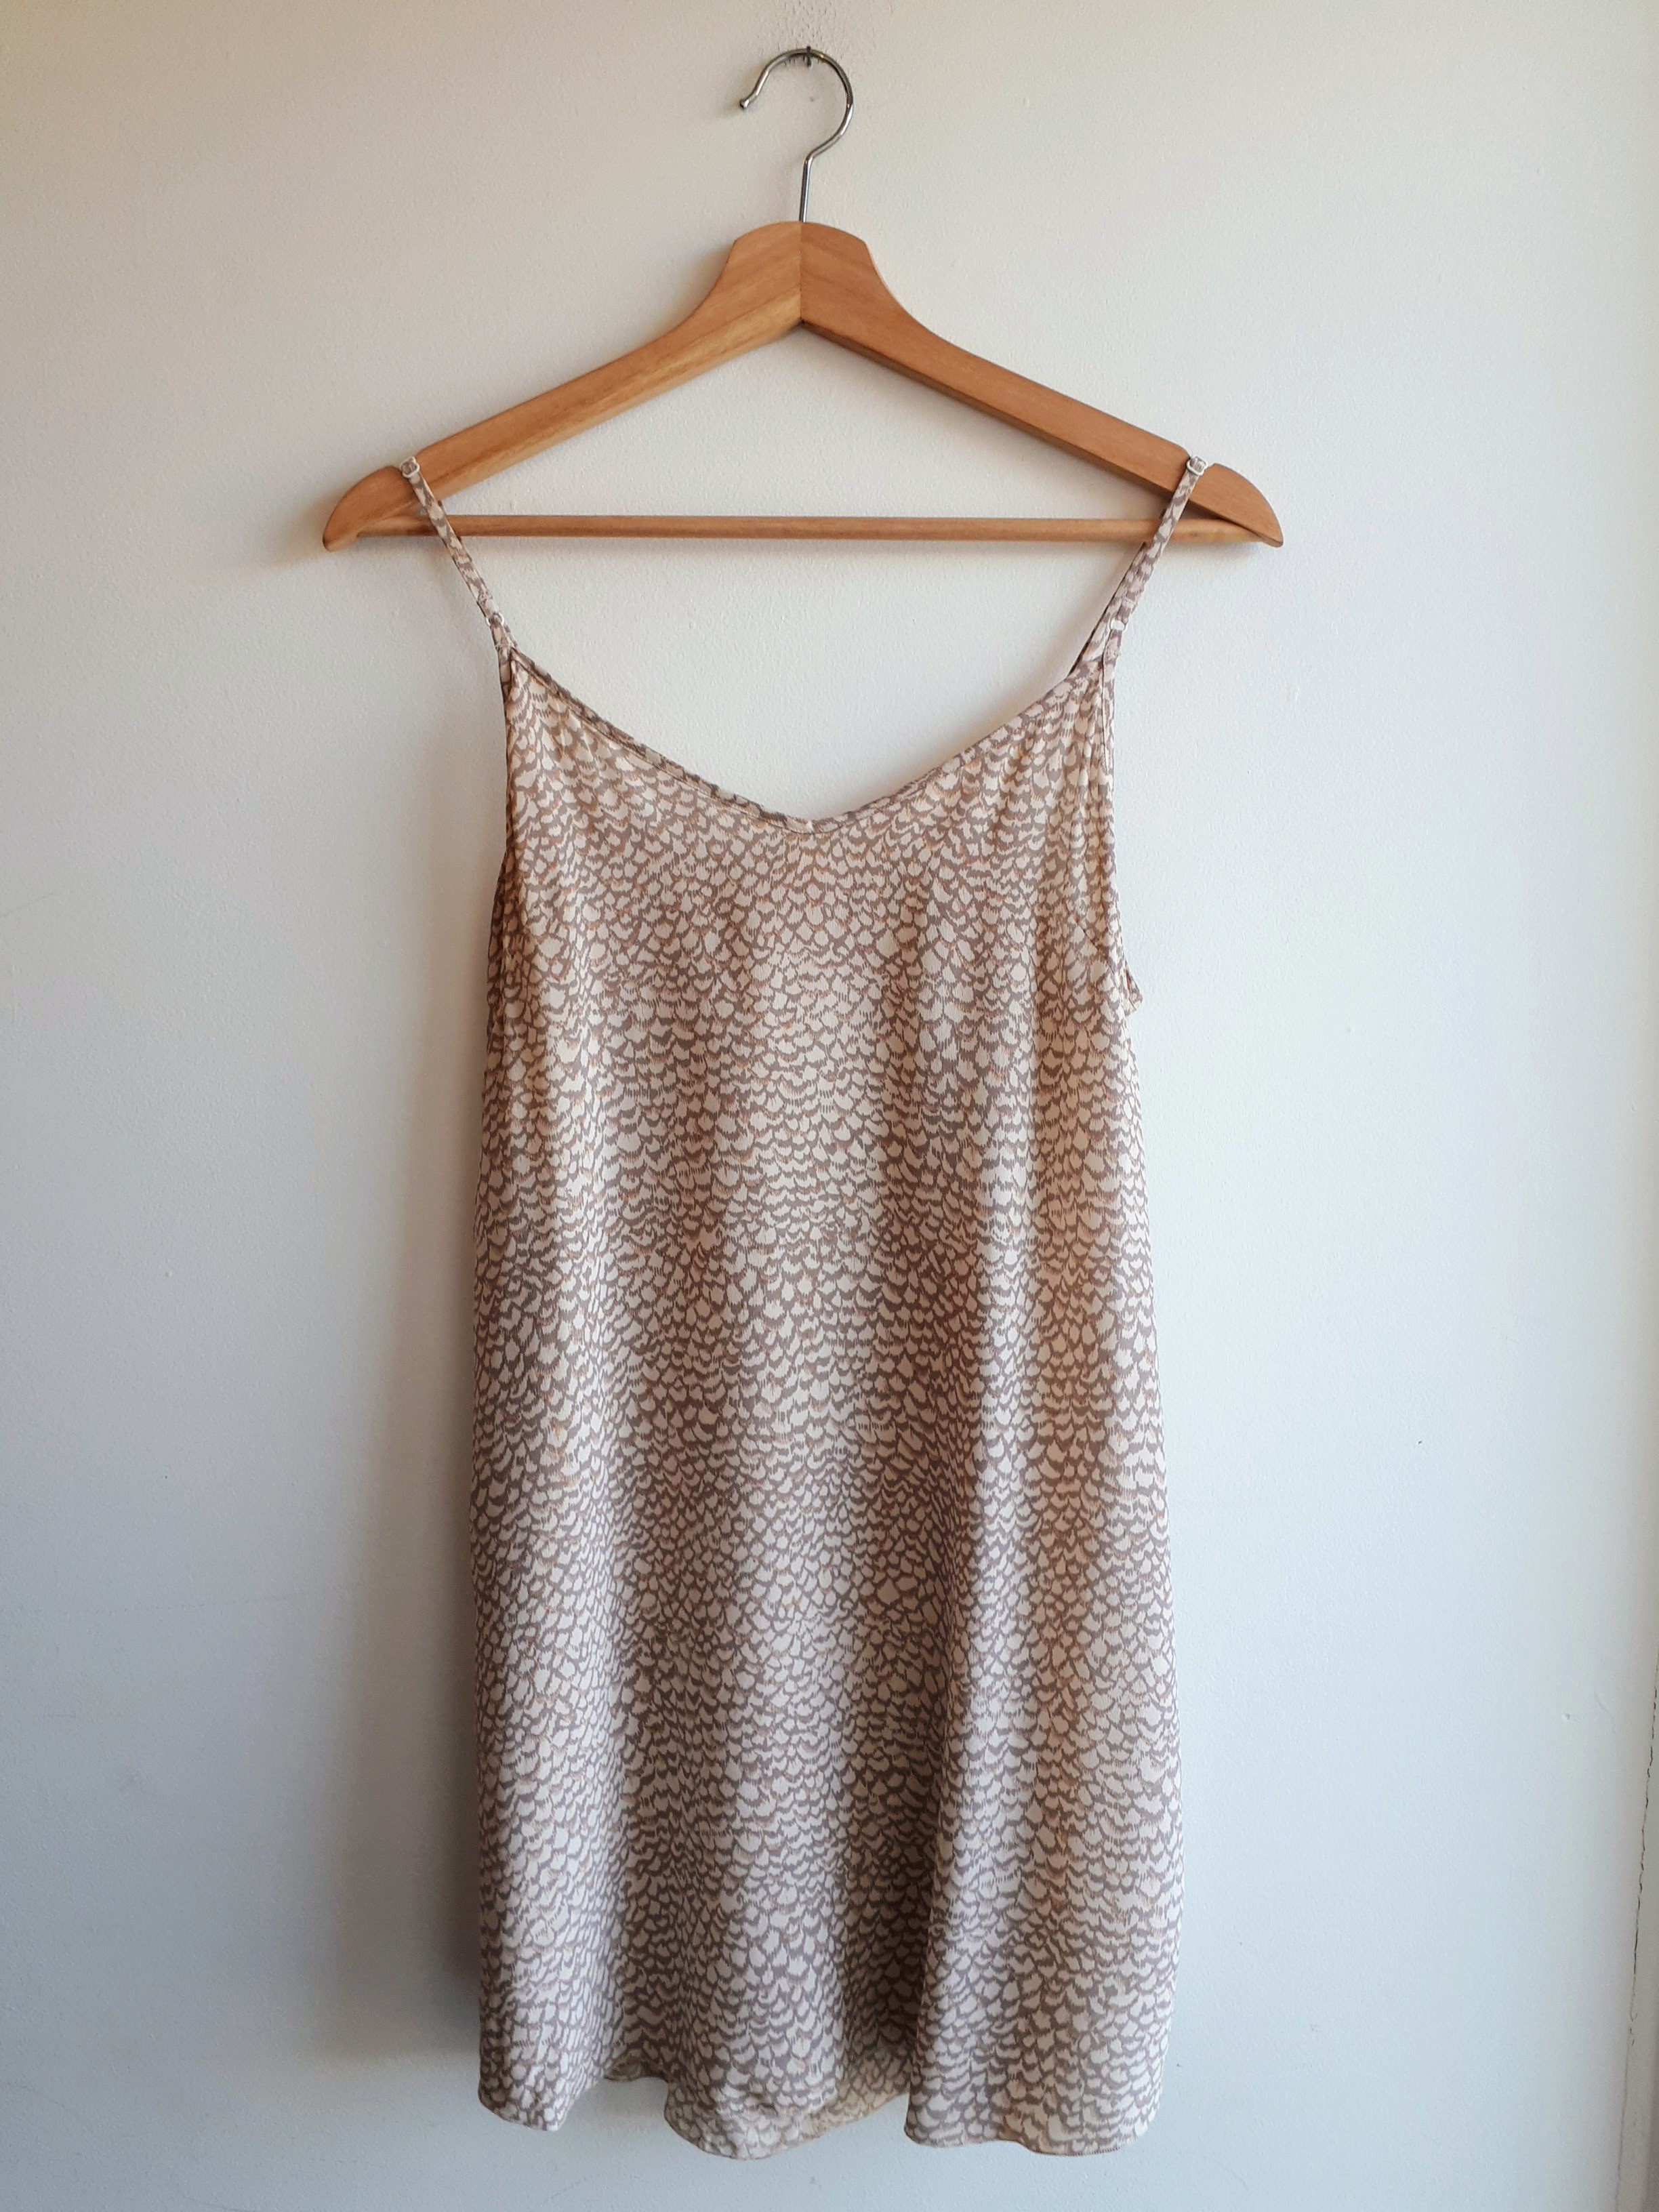 Wilfred dress; Size M, $36